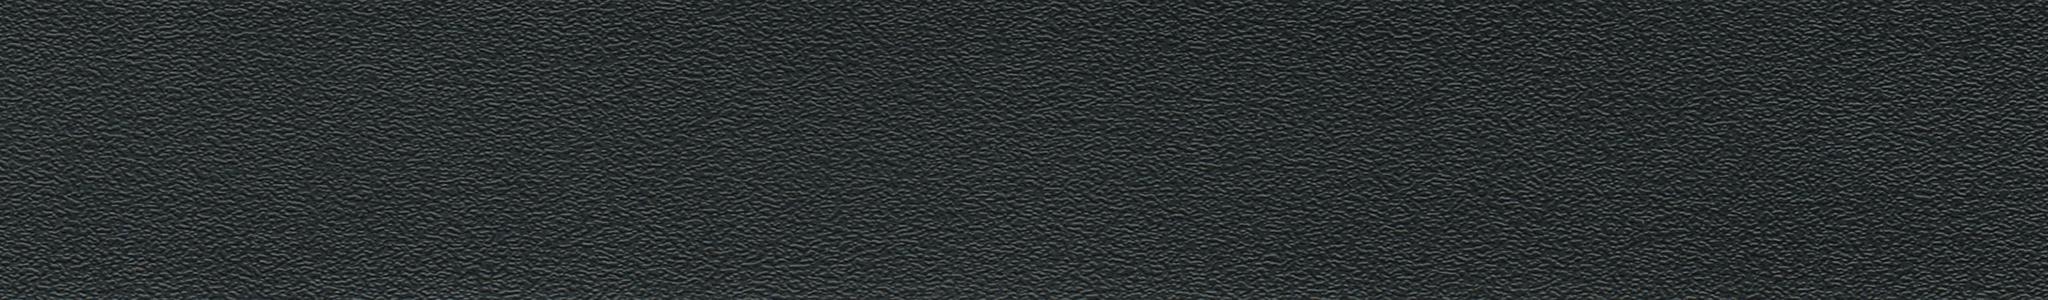 HU 19899 ABS Edge Black Pearl XG